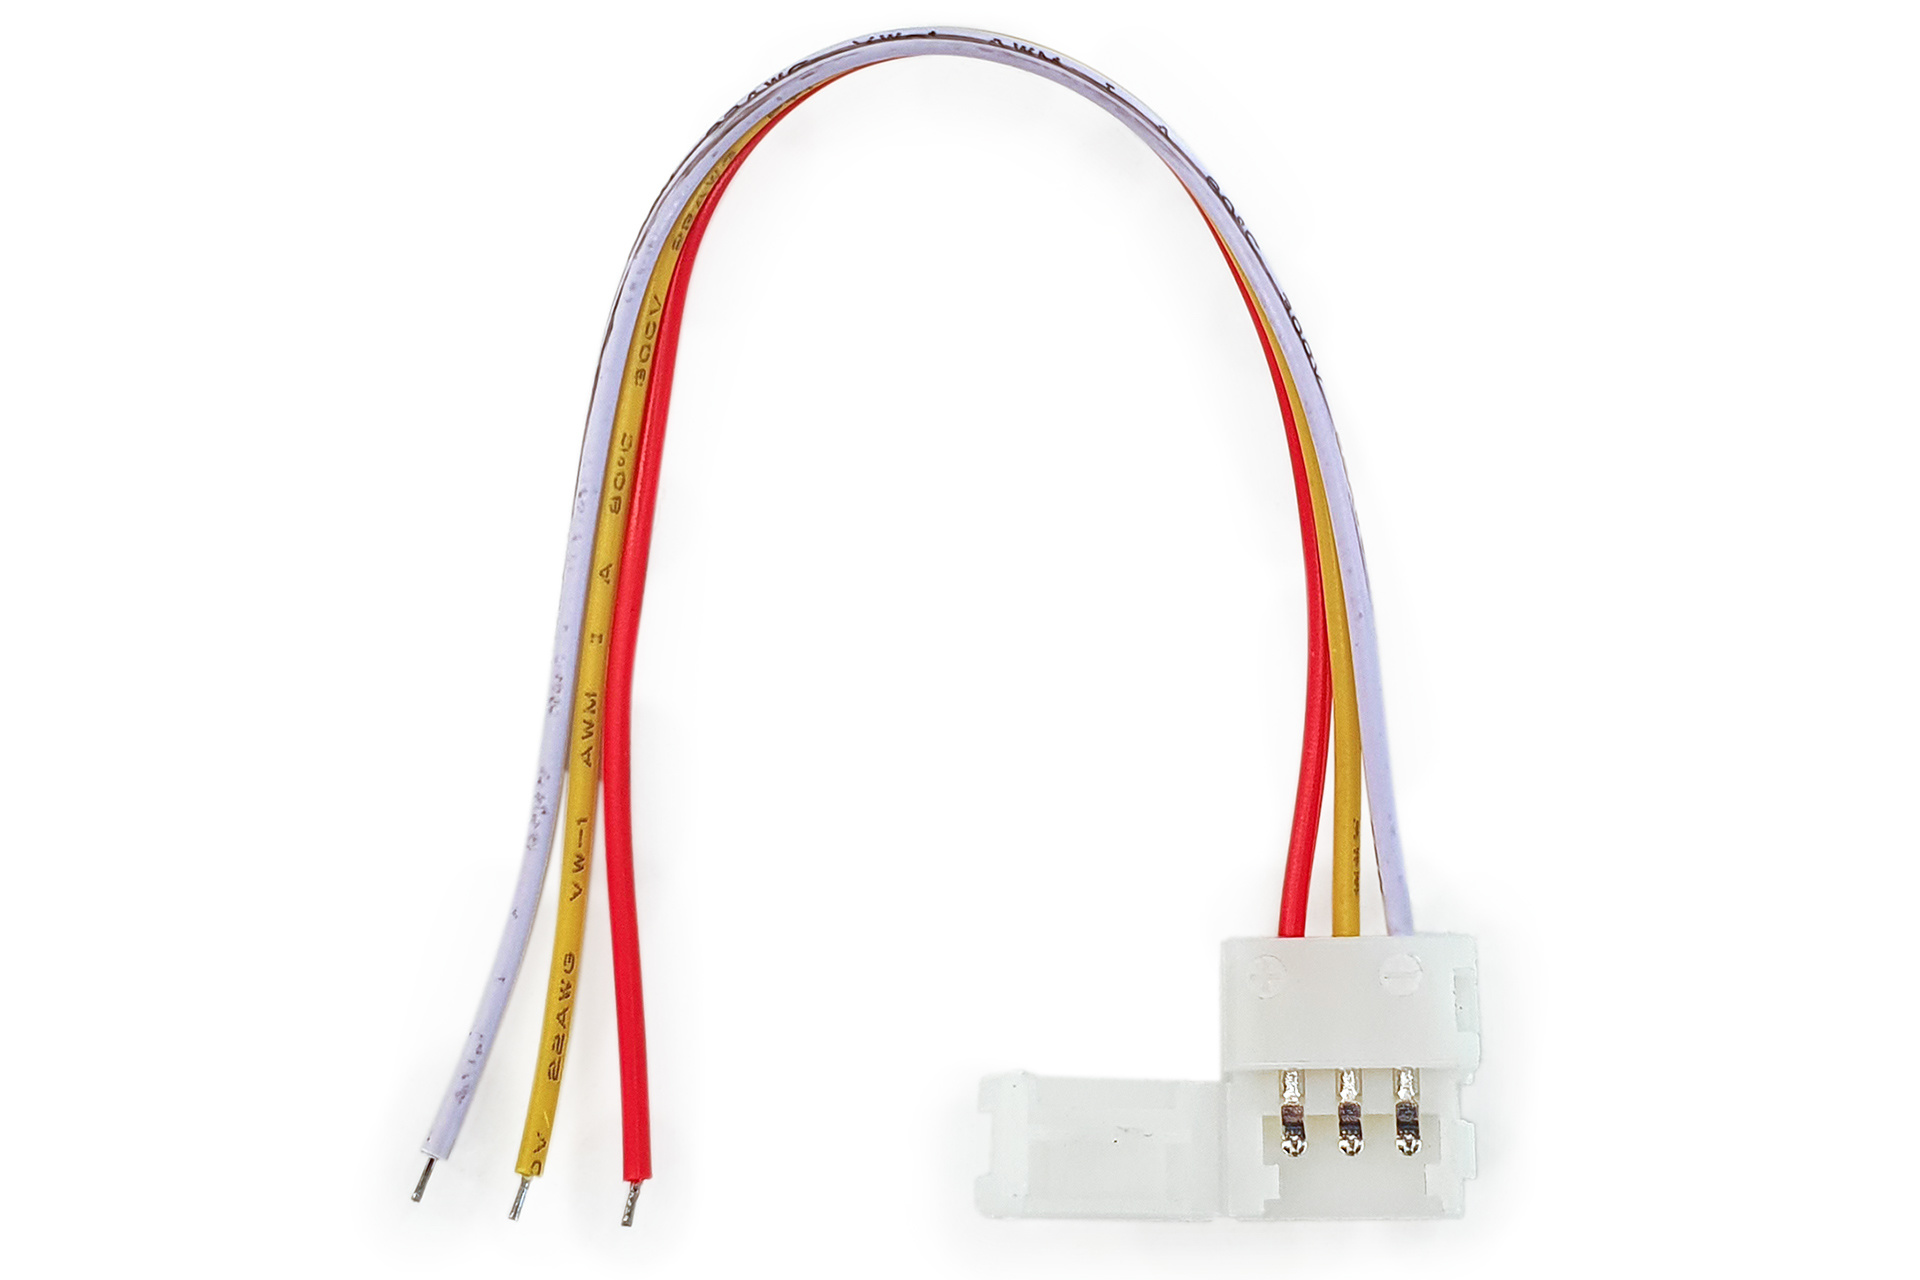 Voedingsconnector voor Dual White CCT Led Strips   Soldeervrij